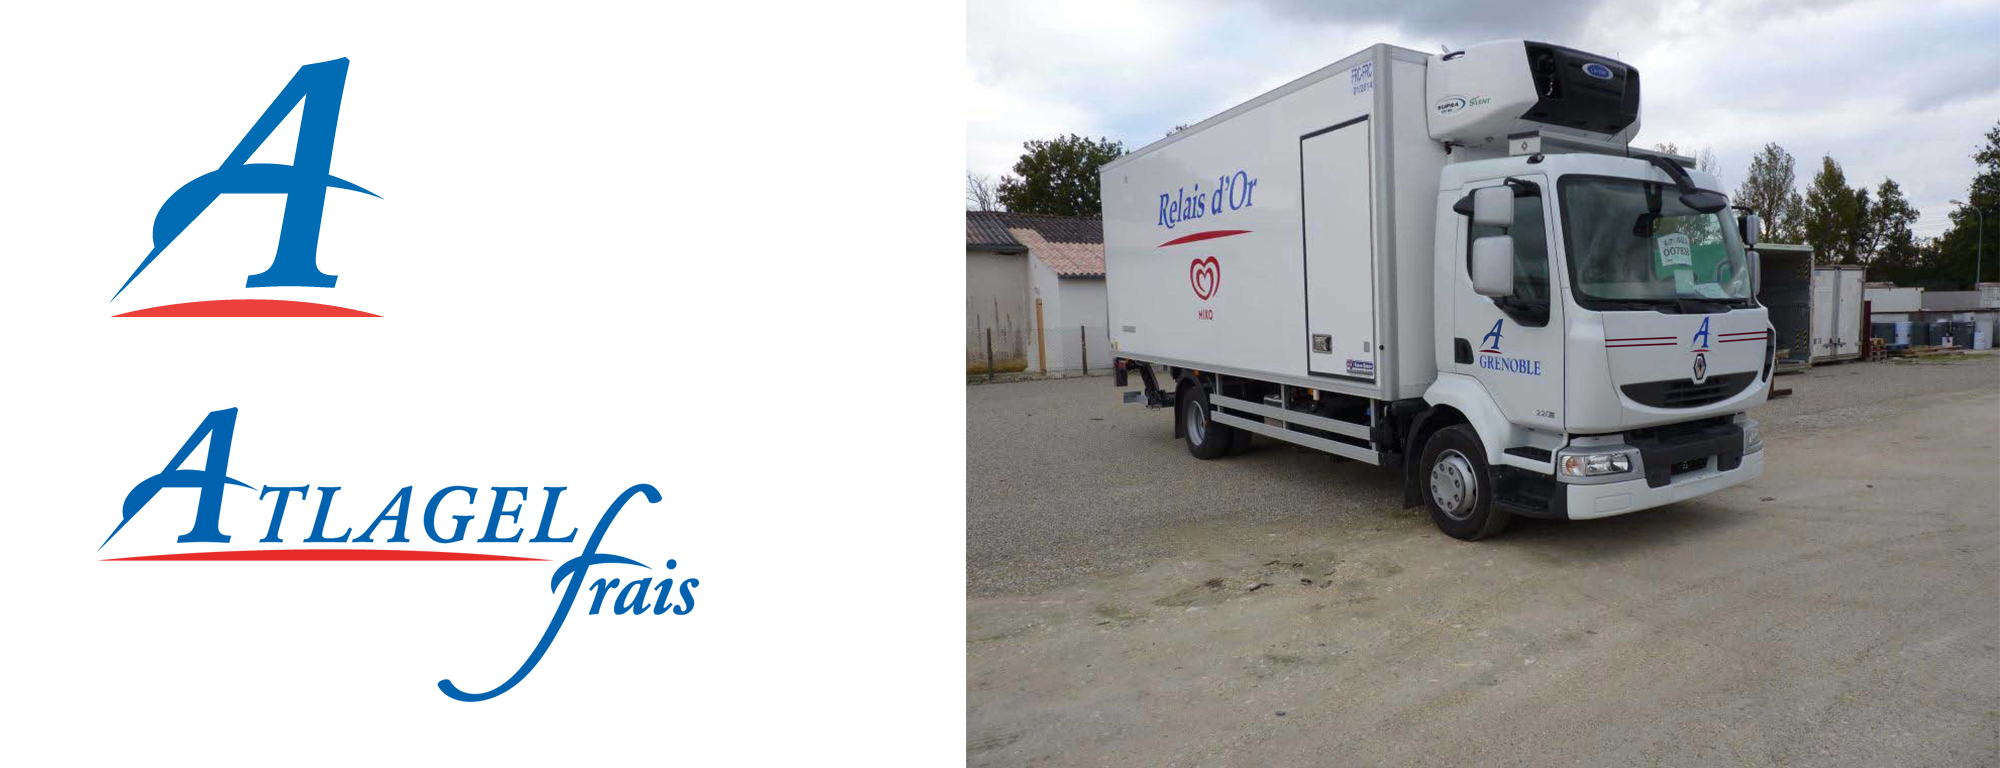 bandeau logos + camion